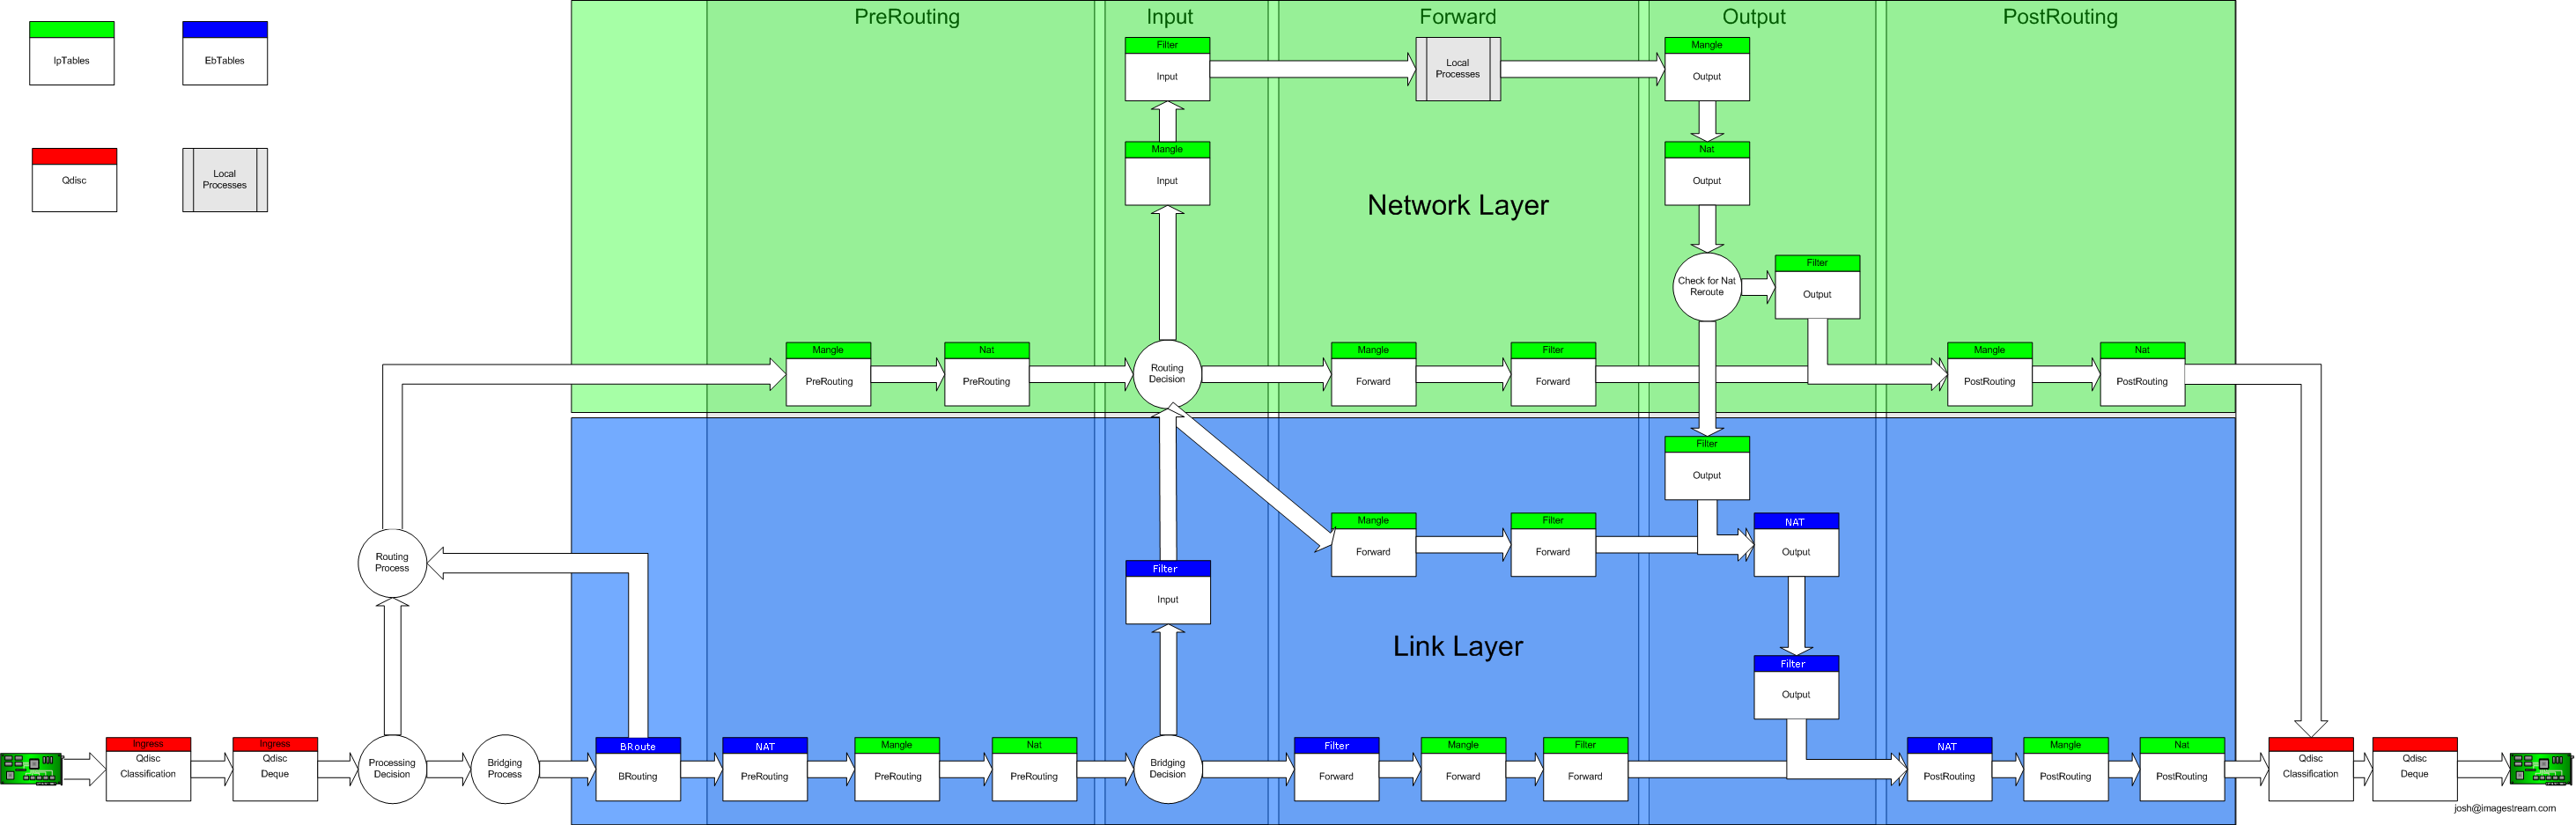 Установка 3proxy с поддержкой http(s) и socks5-proxy на FreeBSD